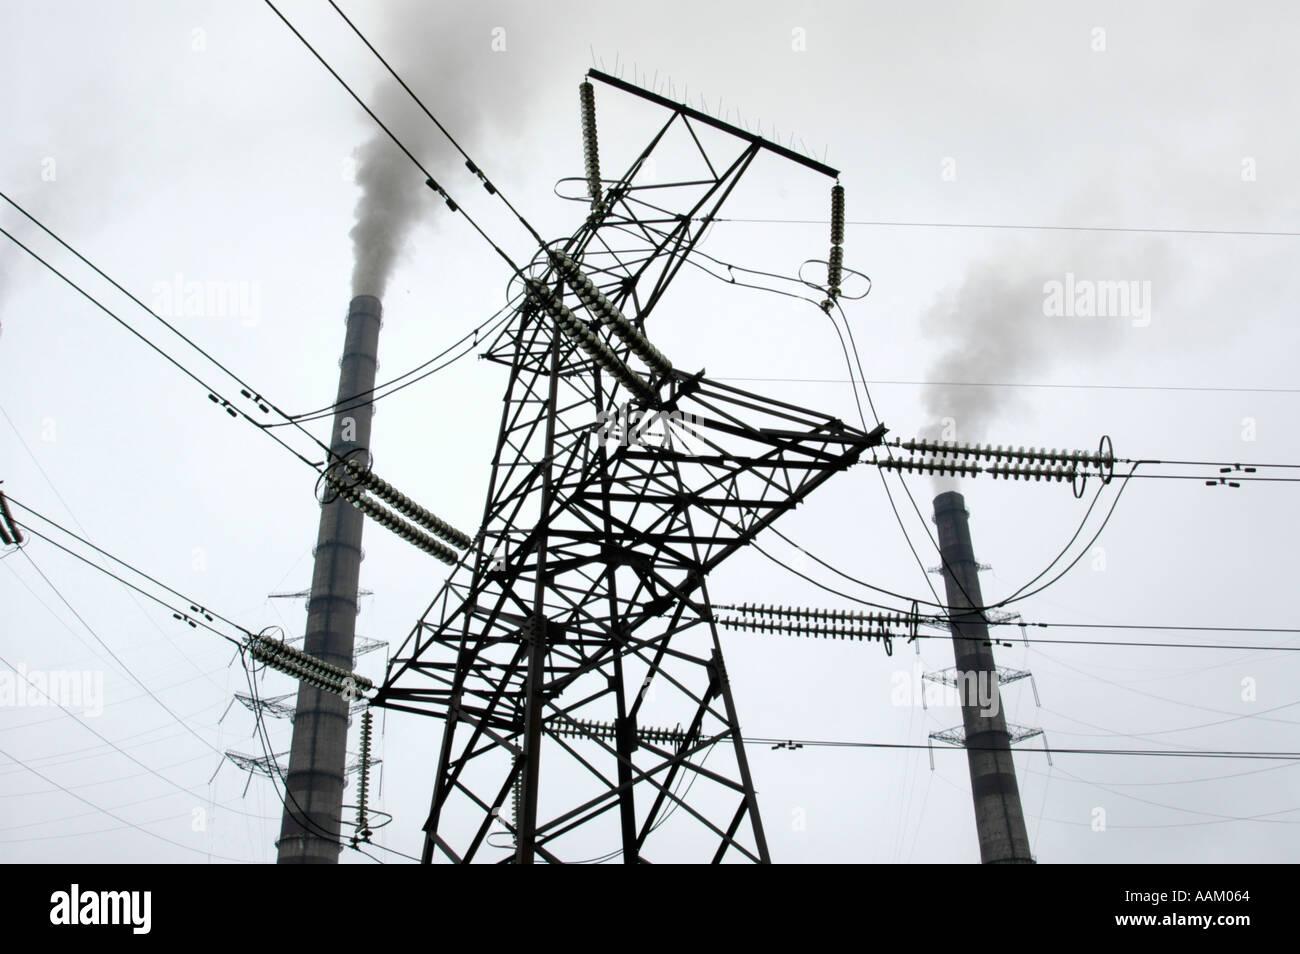 Smoke Stacks High Tension Poles Stock Photo 2343011 Alamy